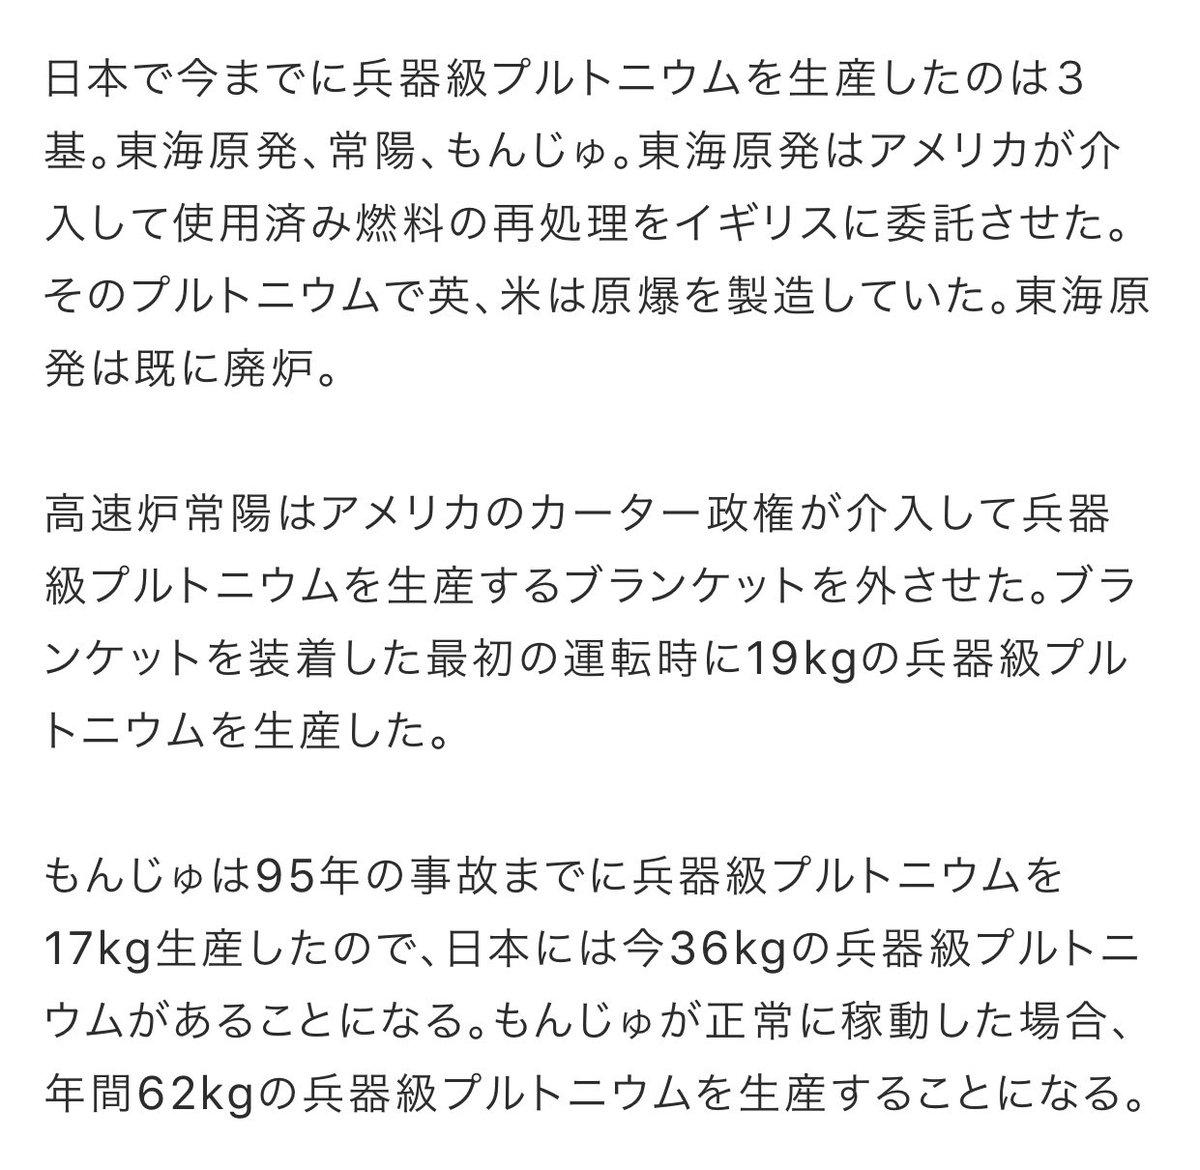 test ツイッターメディア - @kappanotawagoto @toshimasa0275 実はできるらしいです。 現在は高速炉常陽(現在休止中)だけかな。あとはあの「もんじゅ」だったようなんですが… https://t.co/b22Q8XGDv6